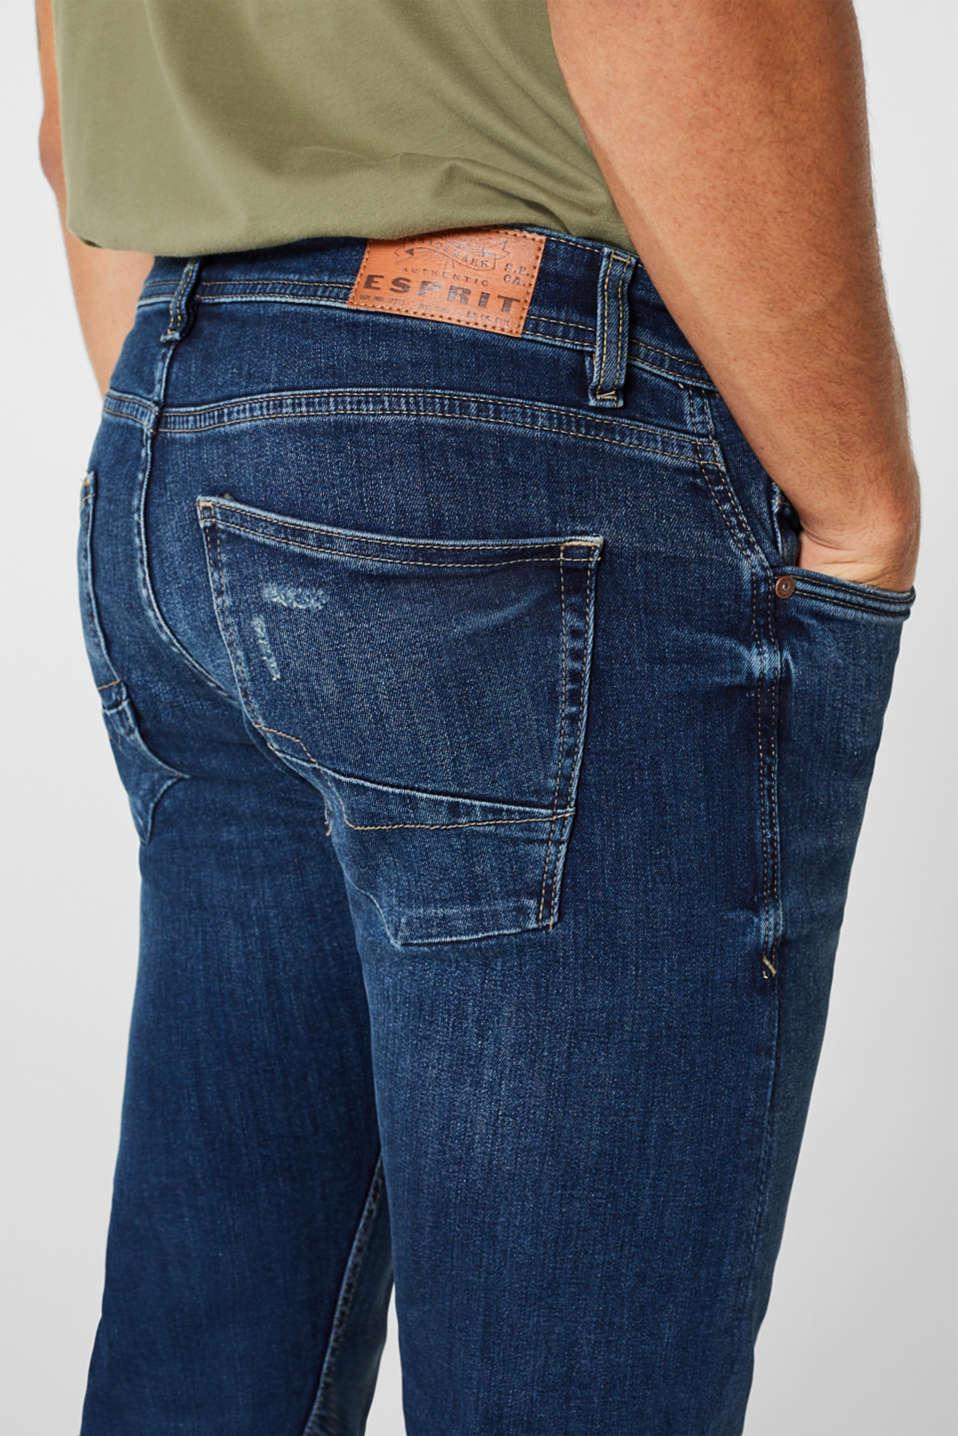 Pants denim Straight fit, BLUE MEDIUM WASH, detail image number 3